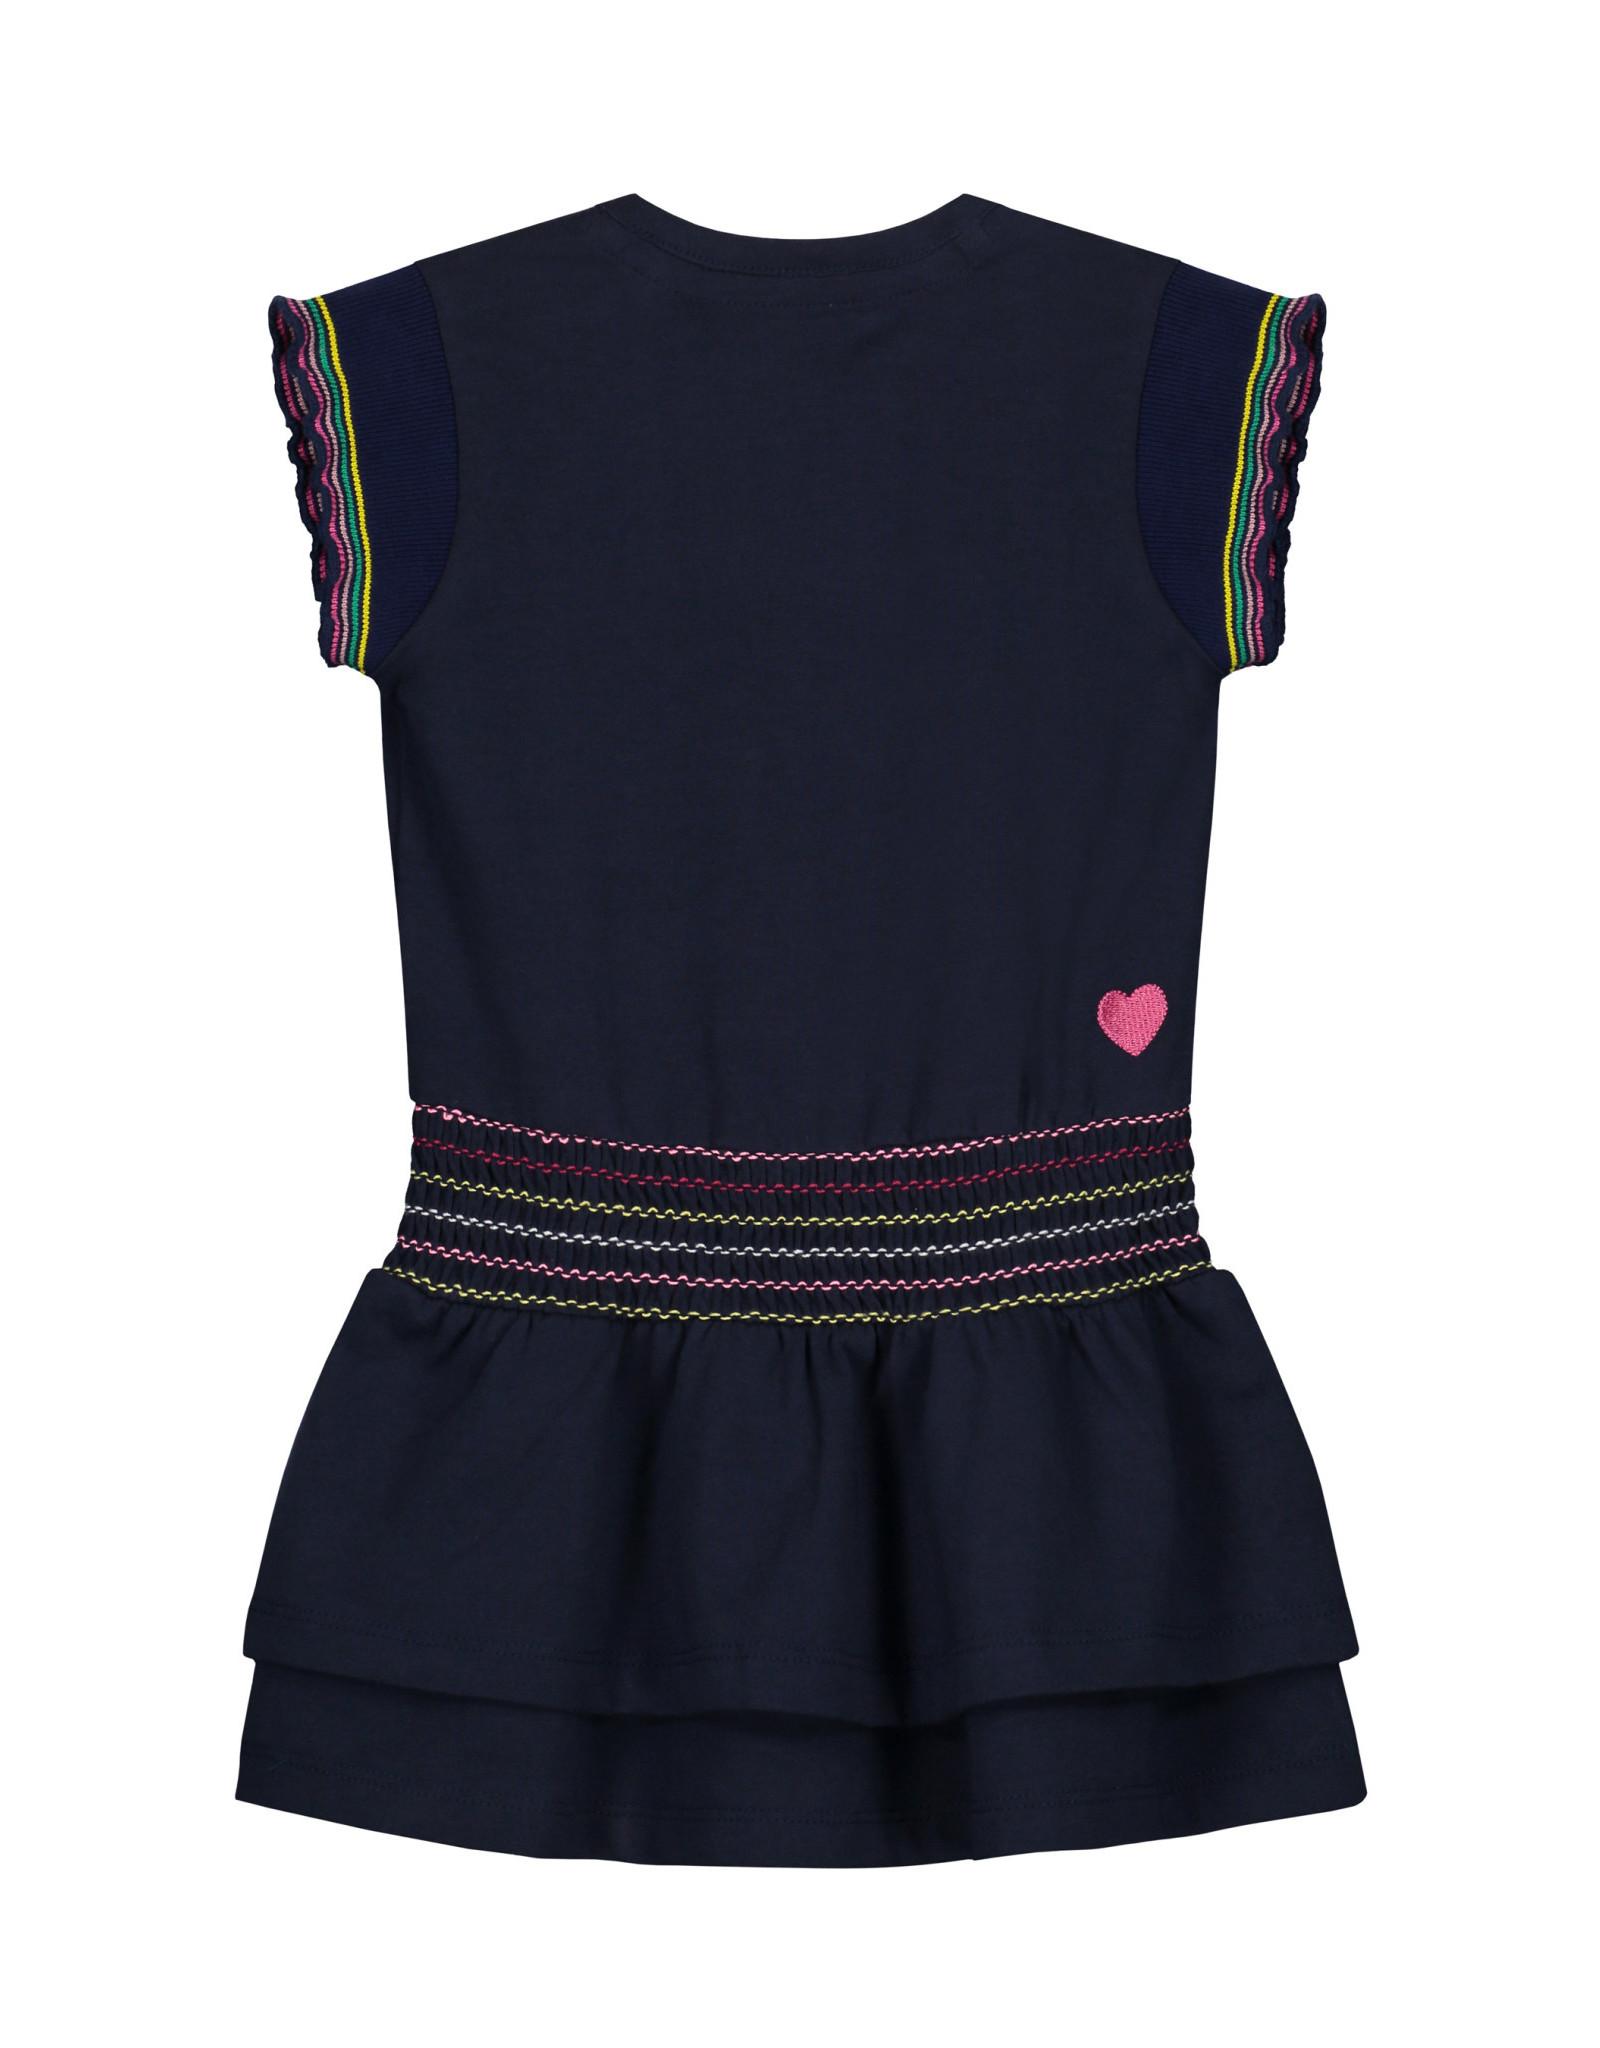 Quapi Quapi baby meisjes korte mouwen jurk Beau Indigo Blue